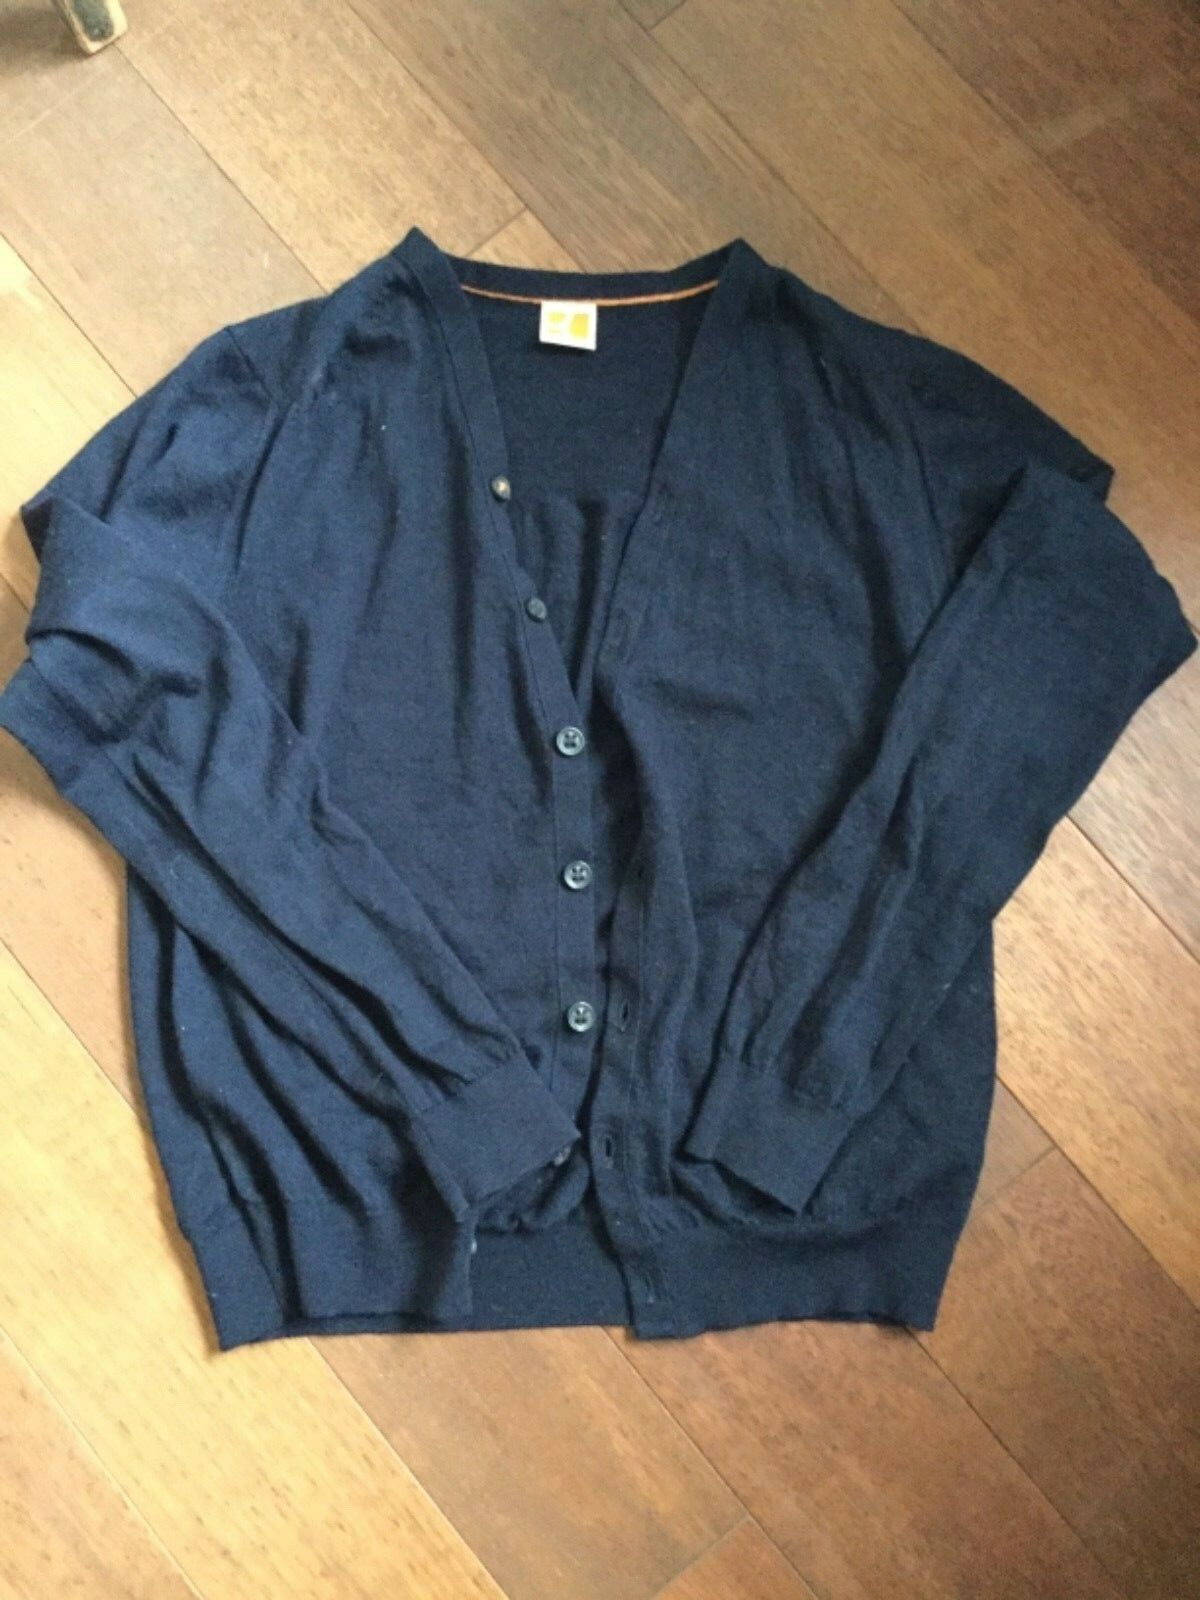 Hugo Boss Herren Pullover Sweathshirt Cardigan Gr. M, dunkelblau w.neu